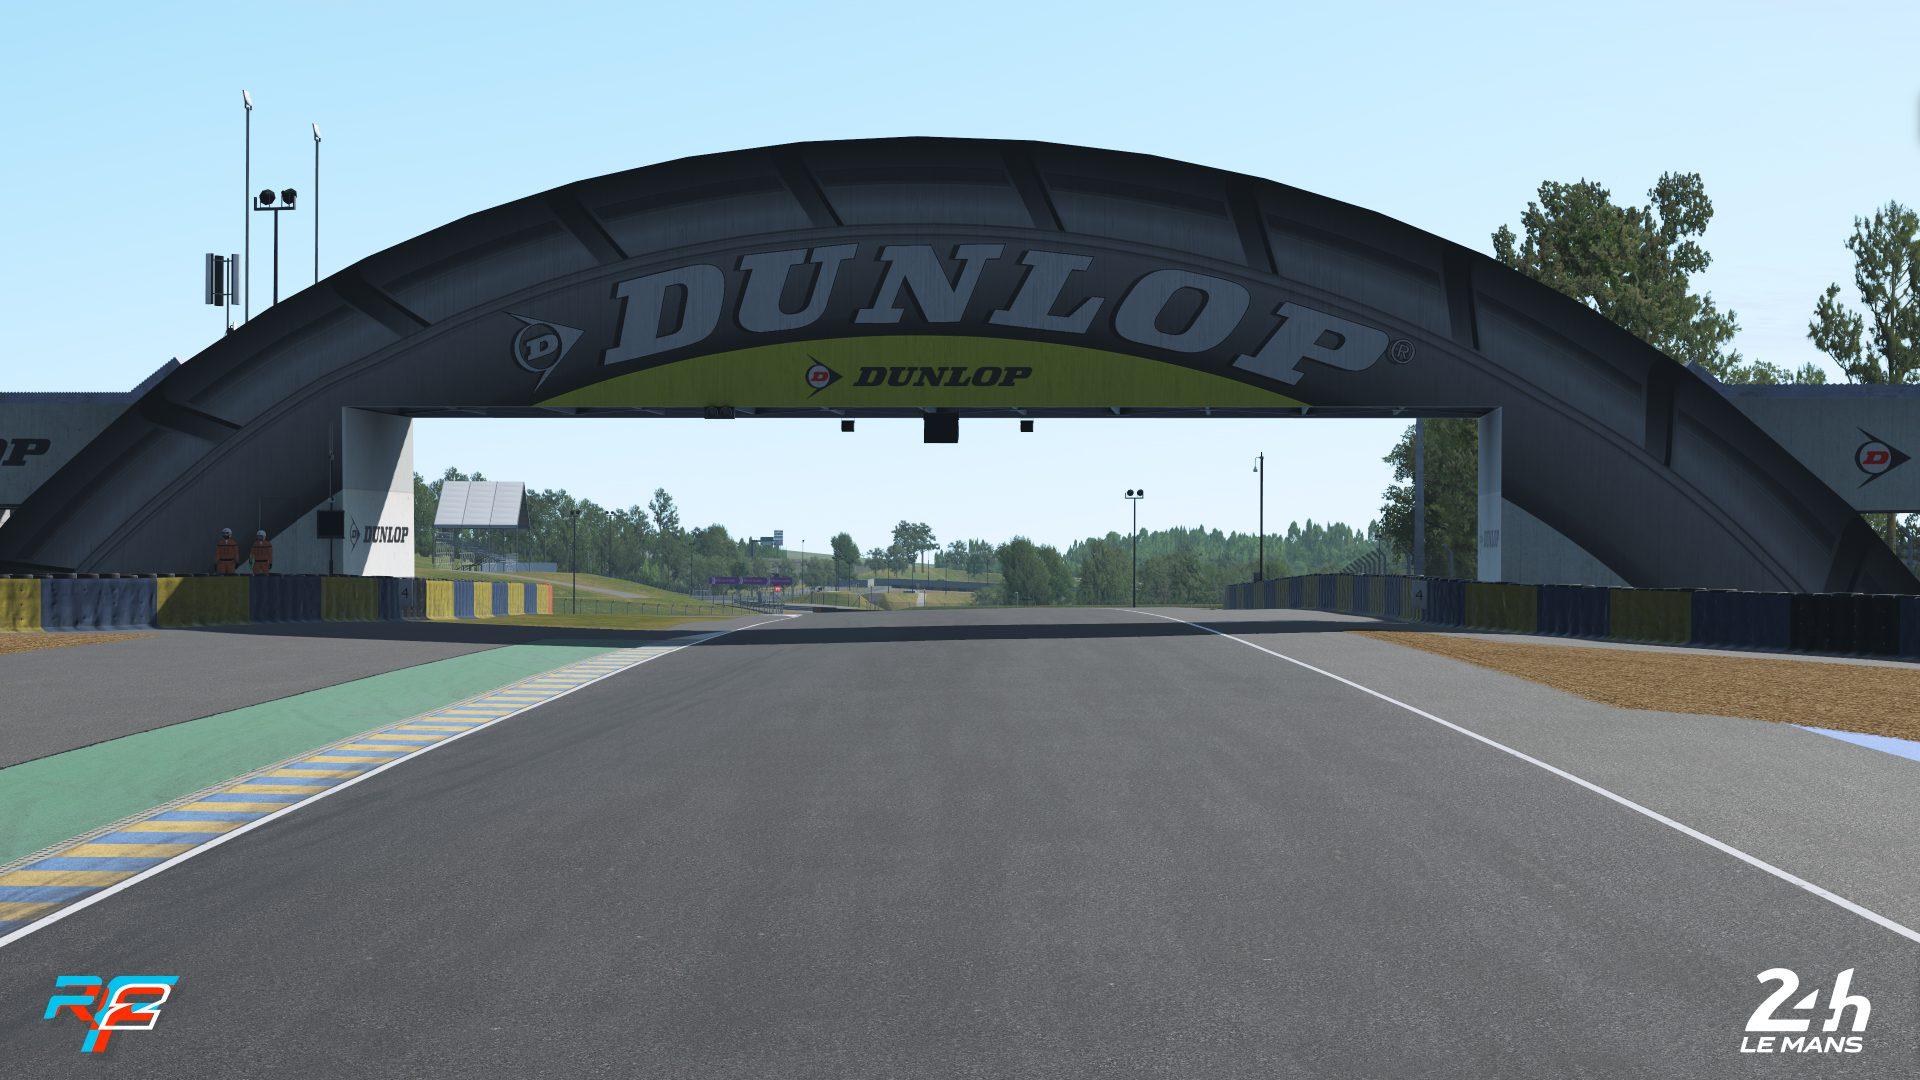 Le-Mans-track-guide-005-1920x1080.jpg